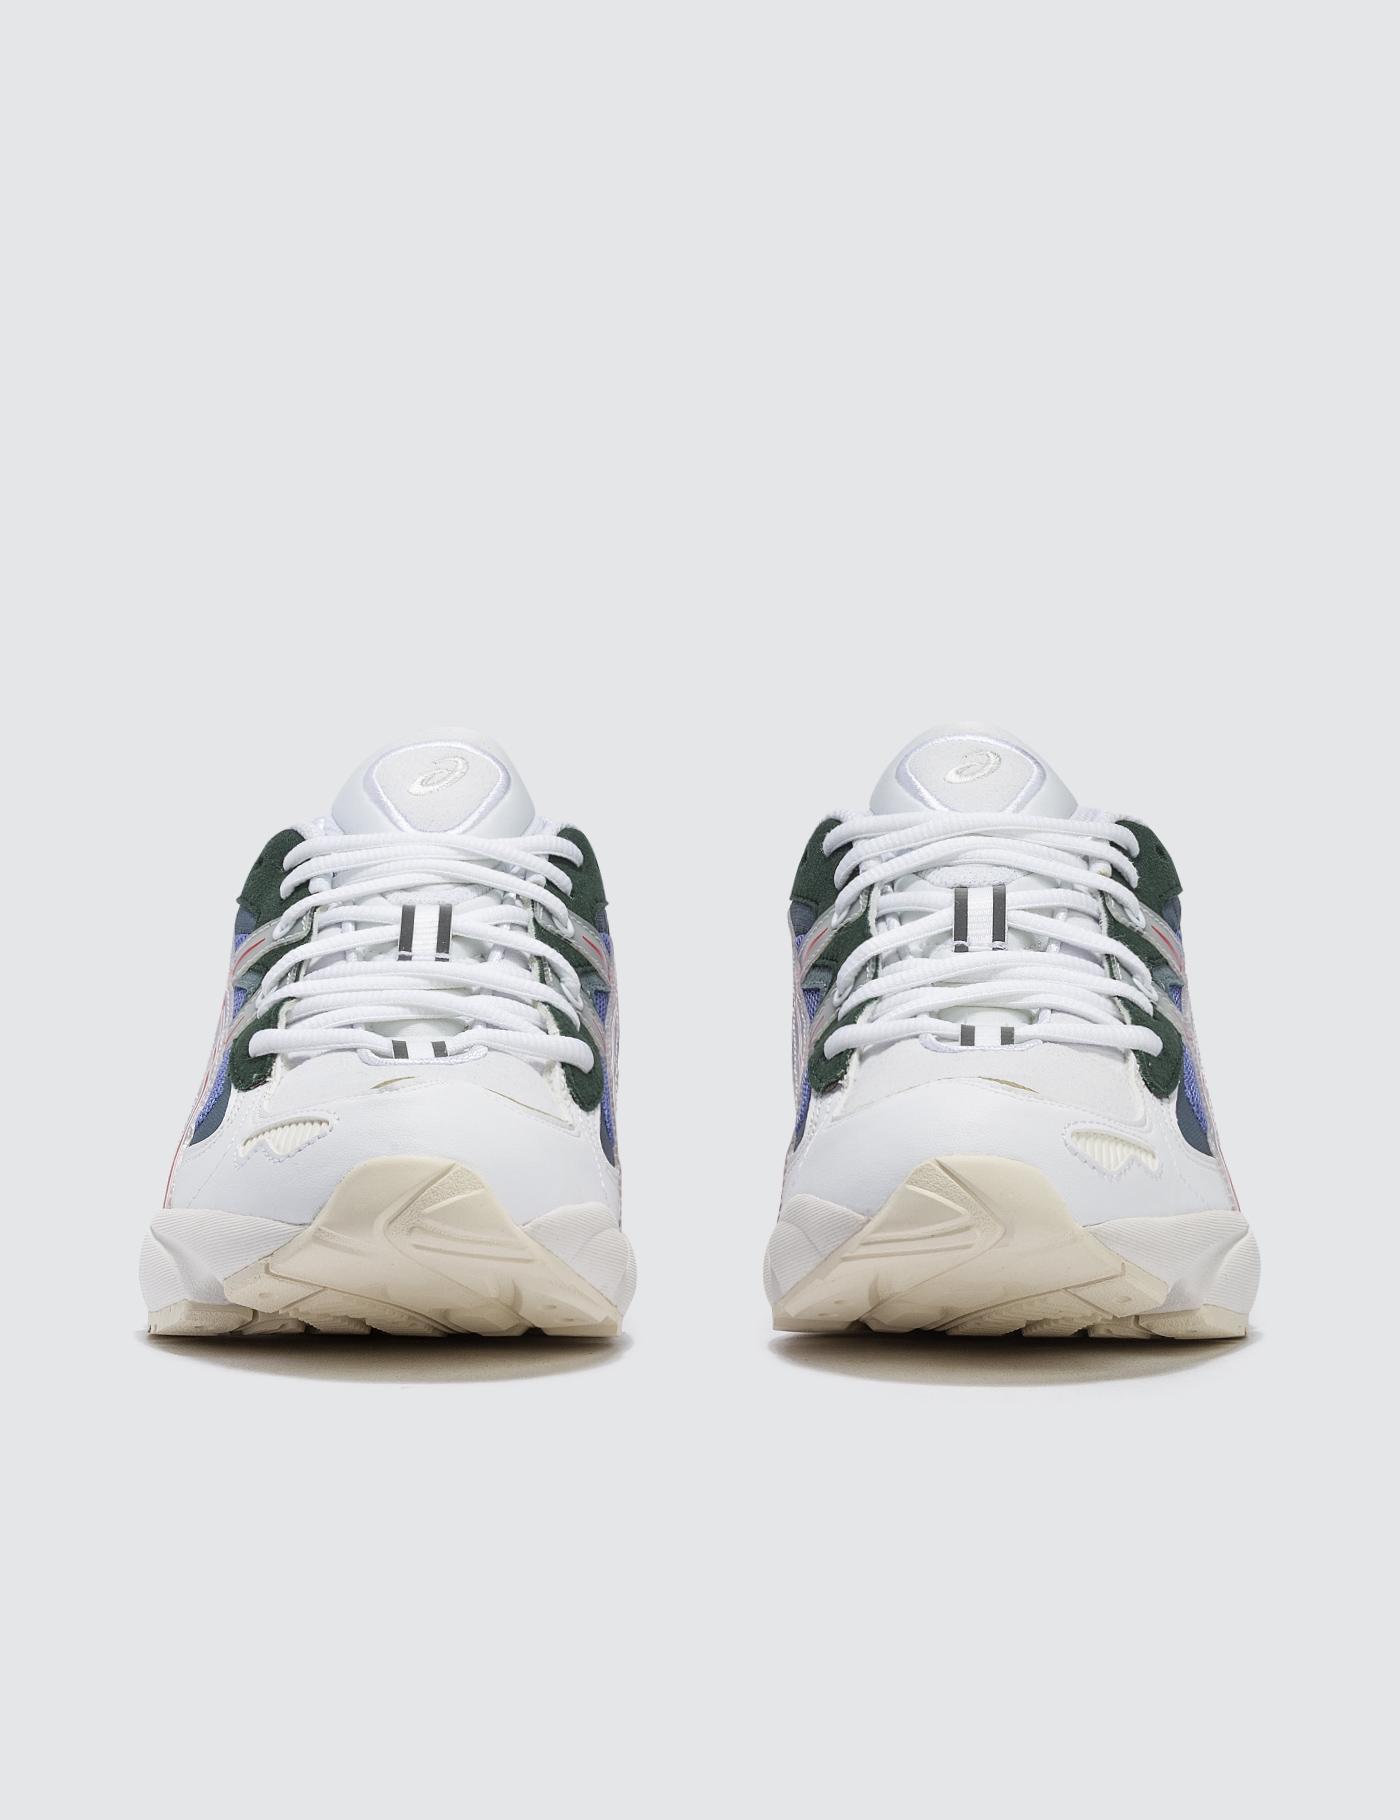 Shoes_1_3.jpg